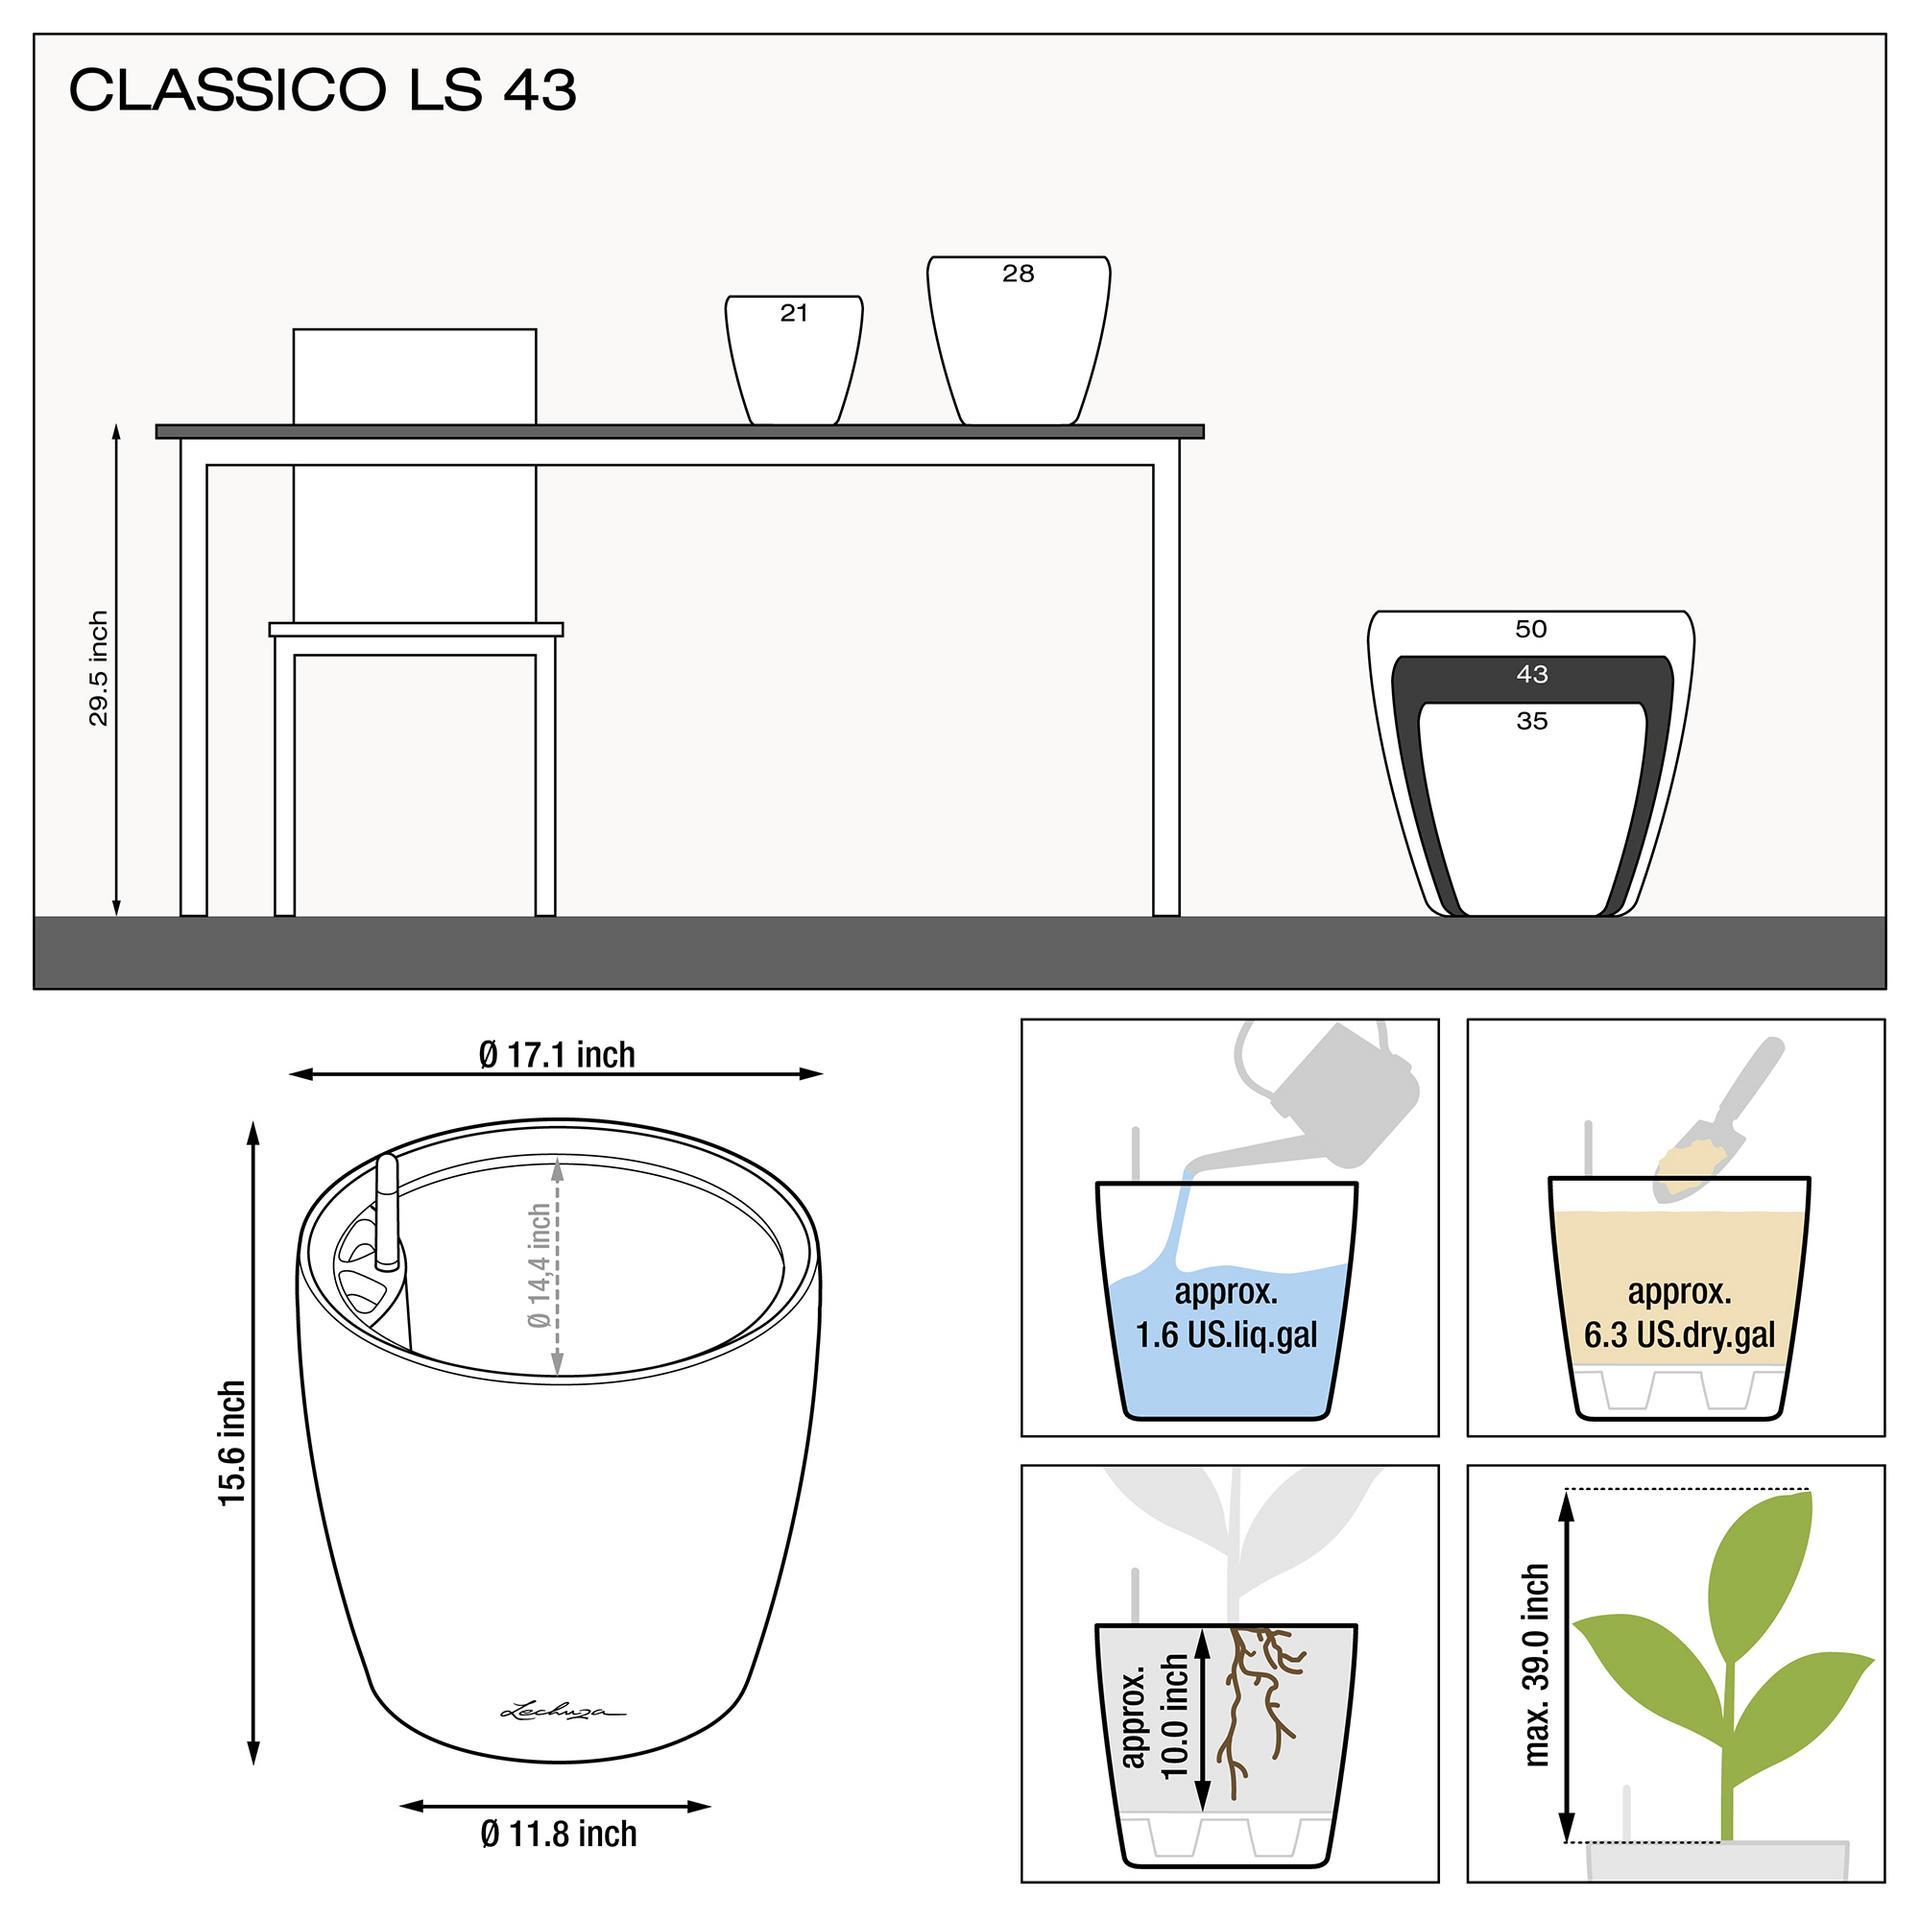 le_classico-ls43_product_addi_nz_us